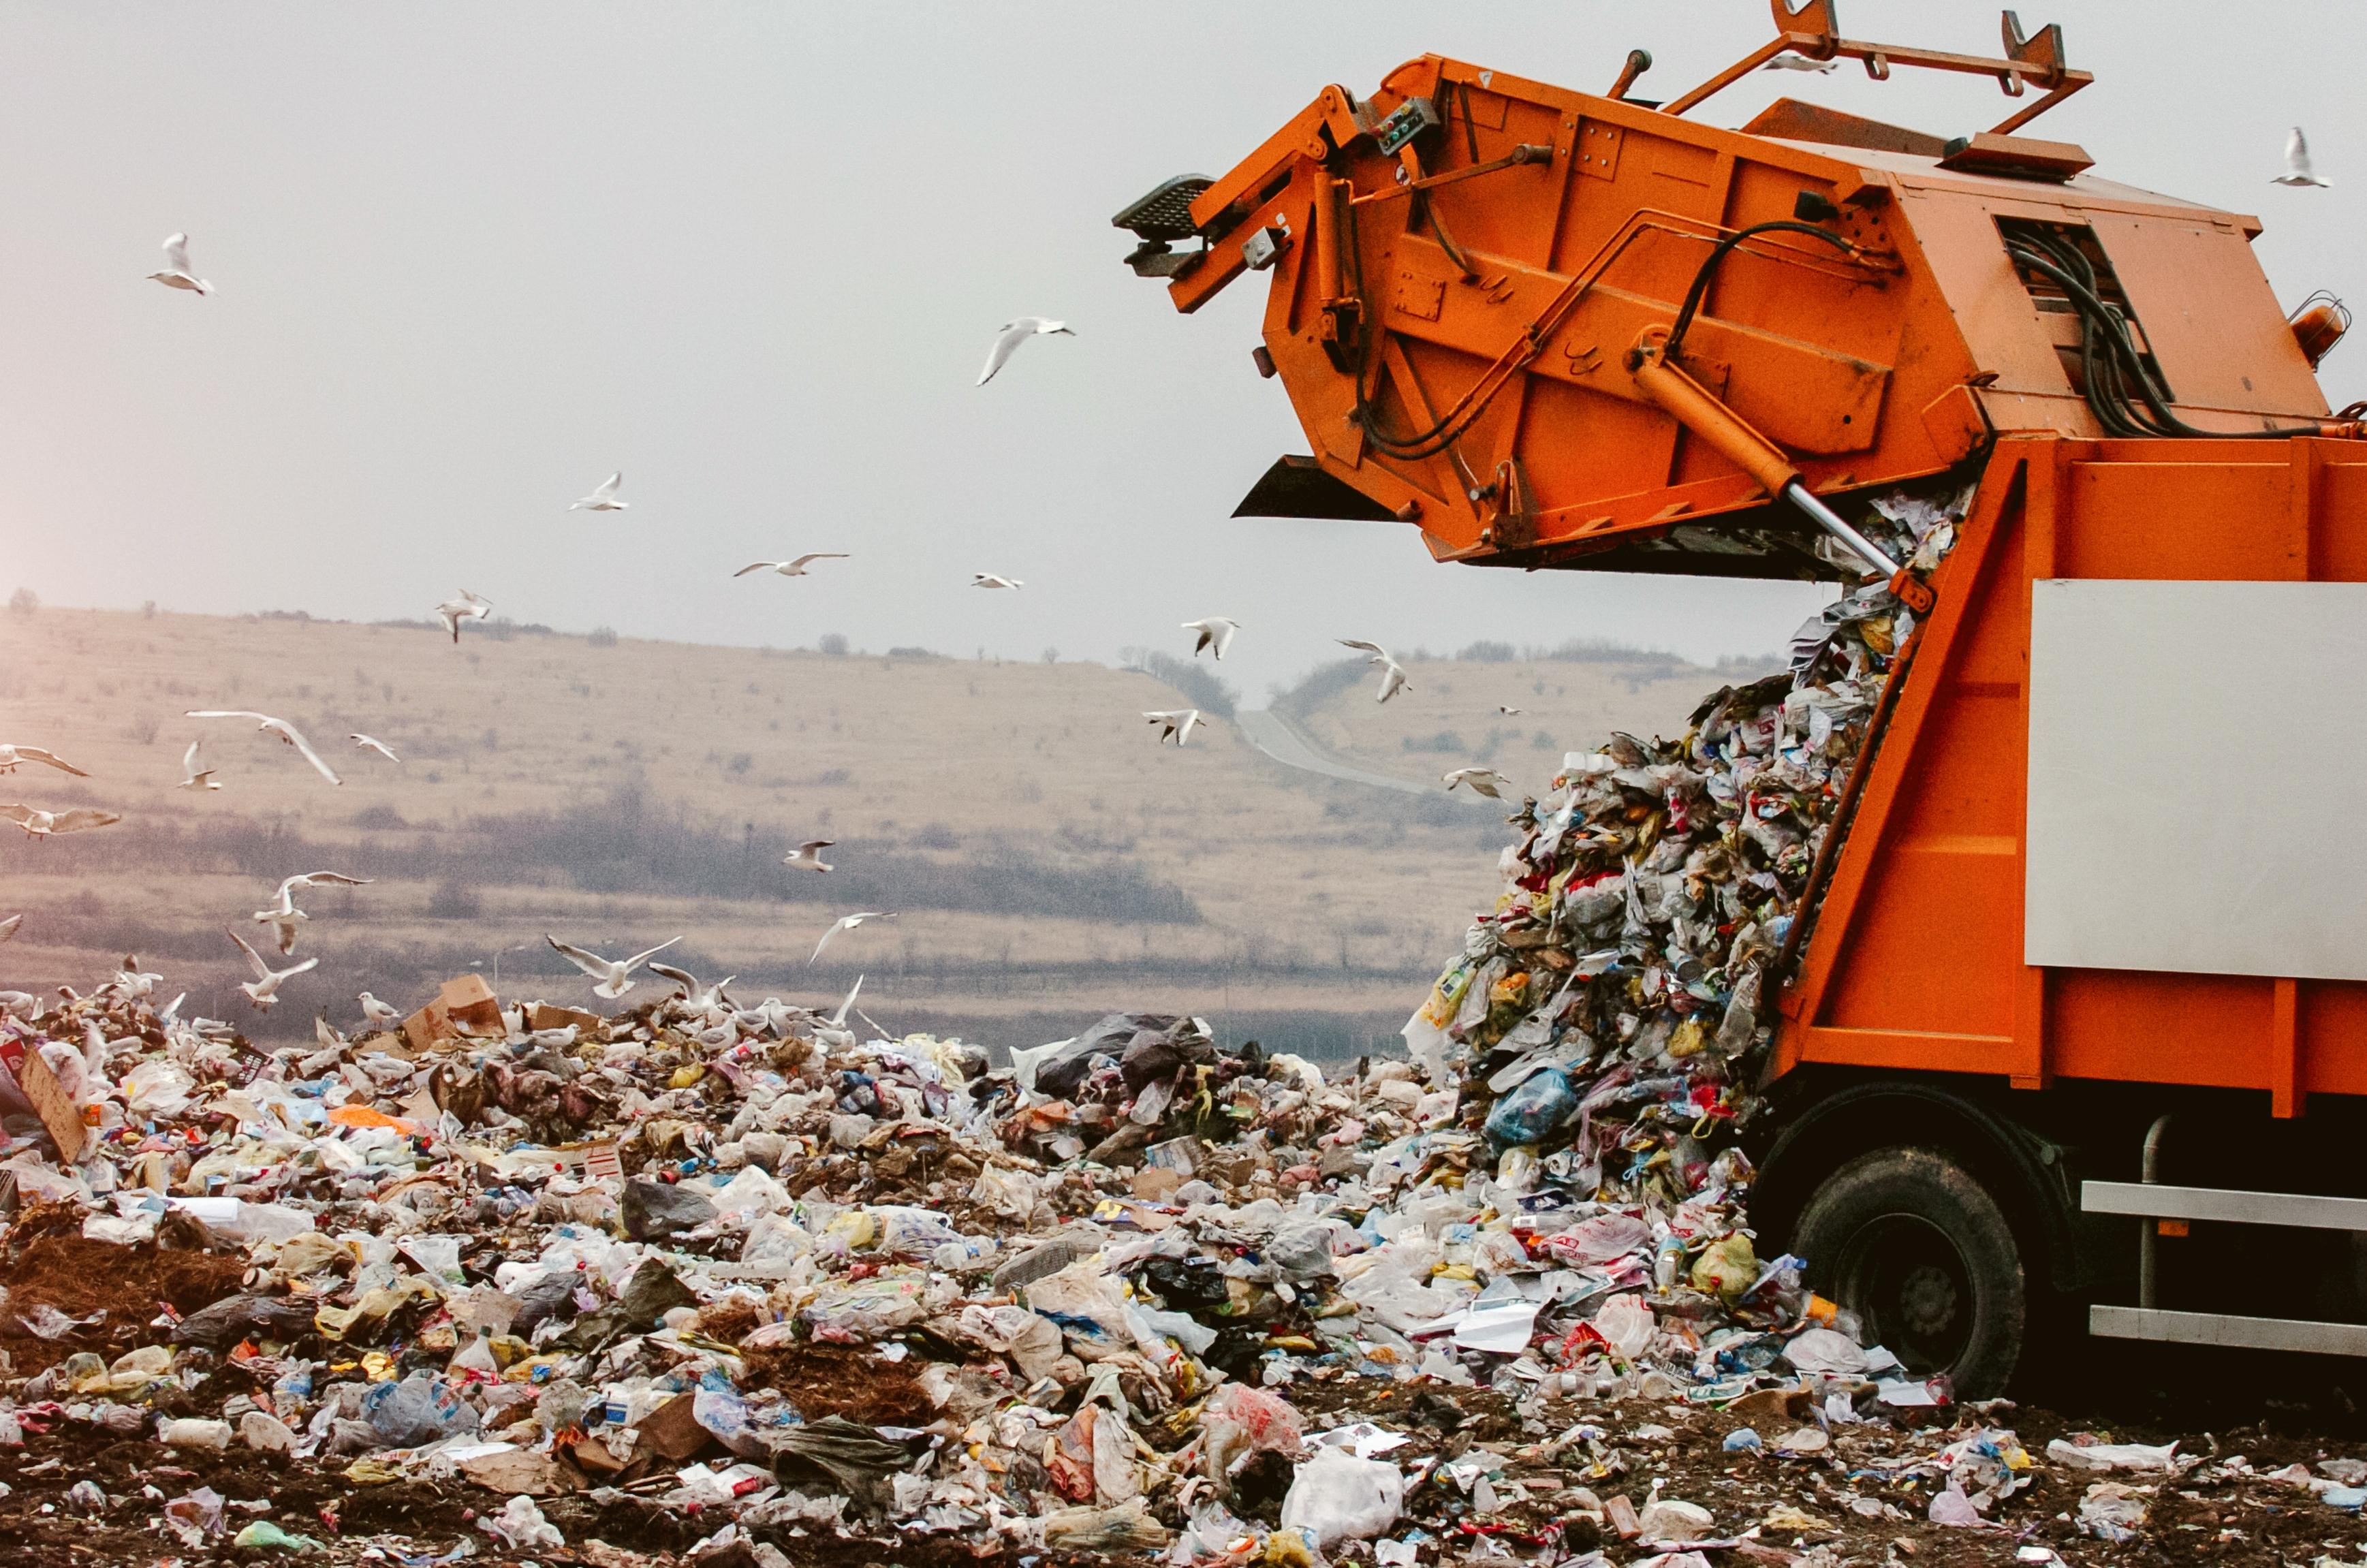 A desert landfill.